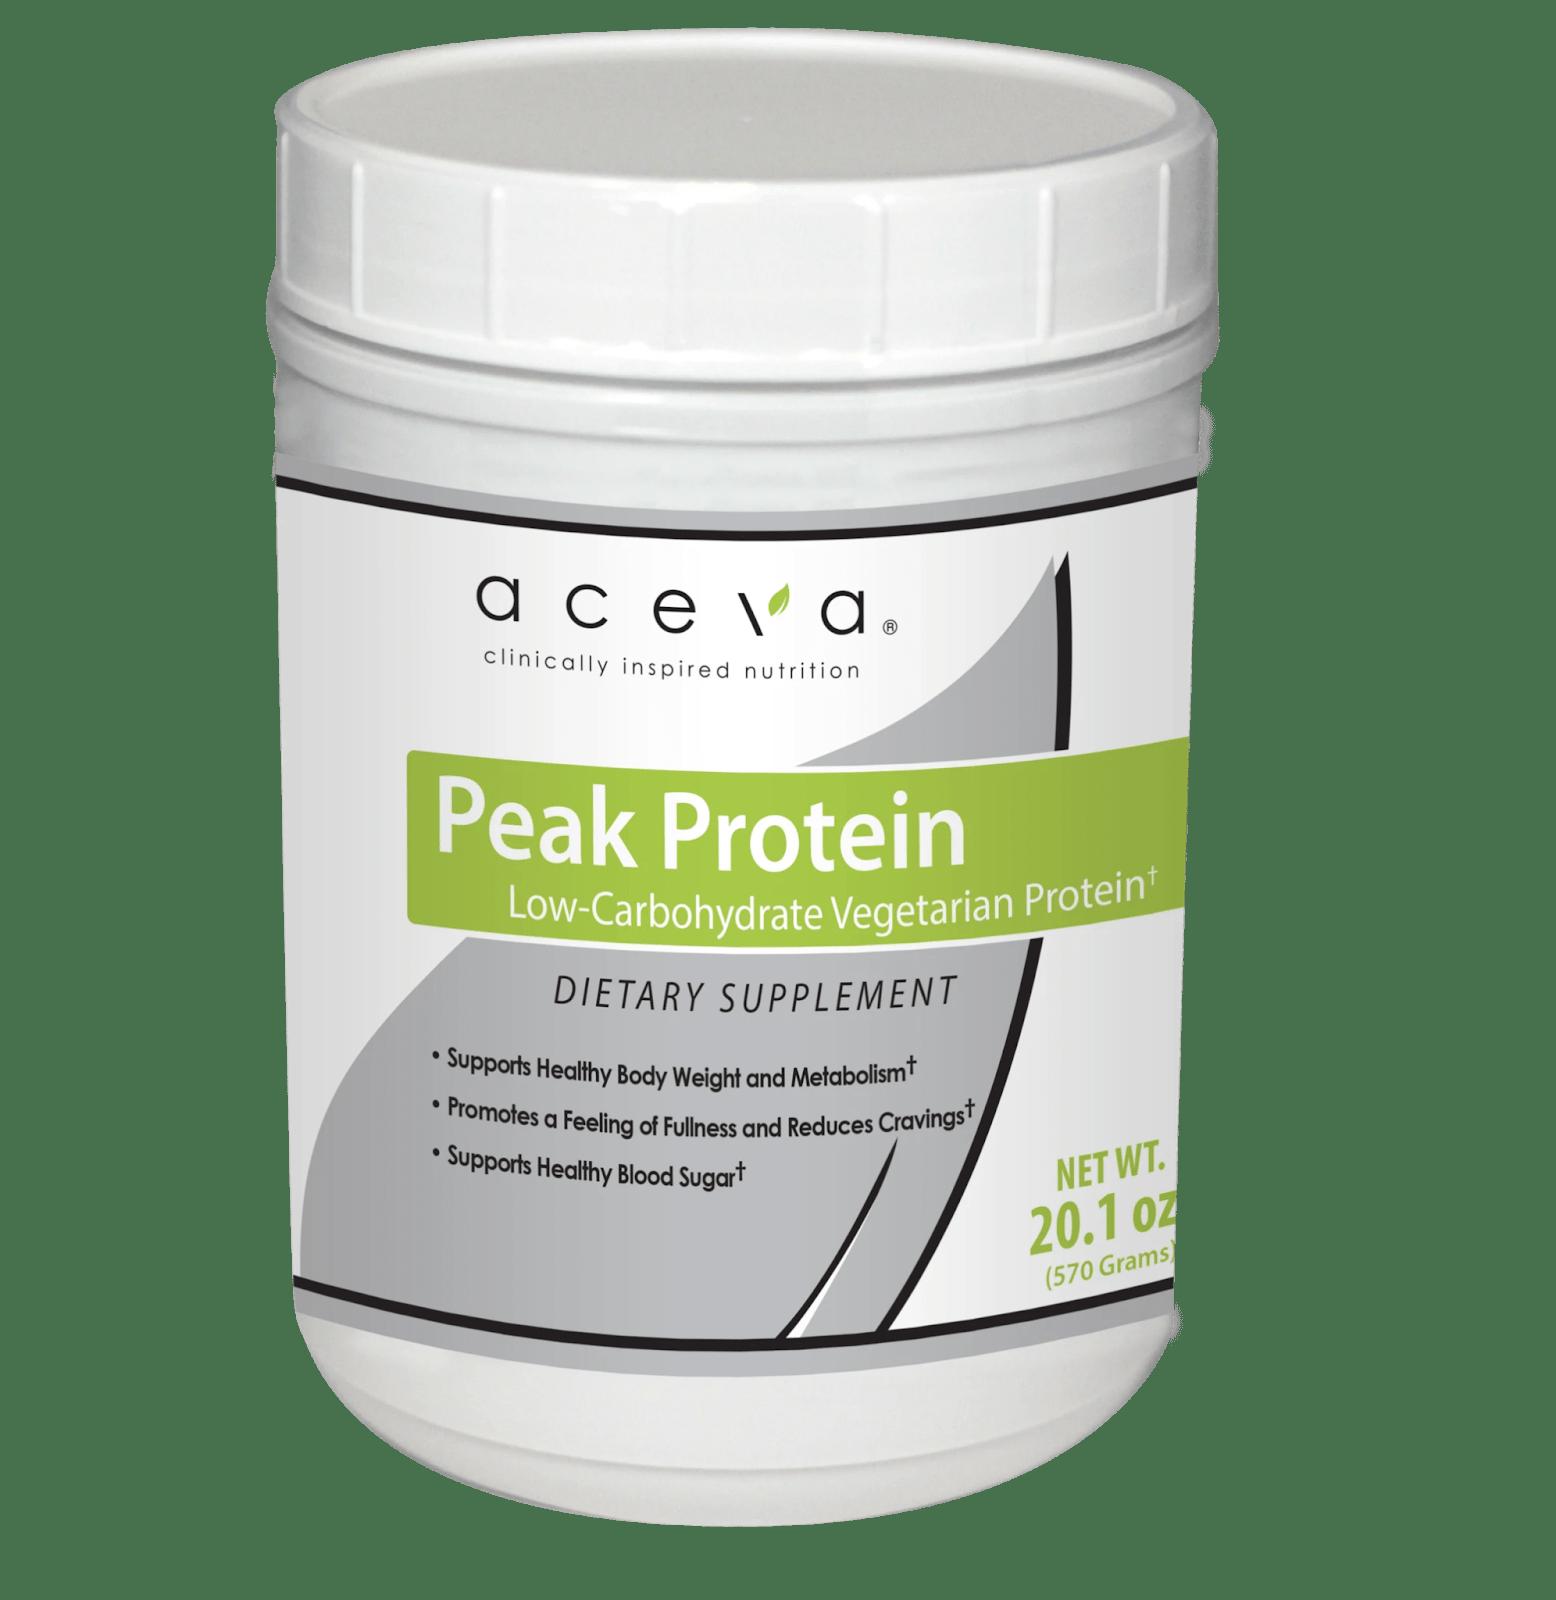 Peak Protein